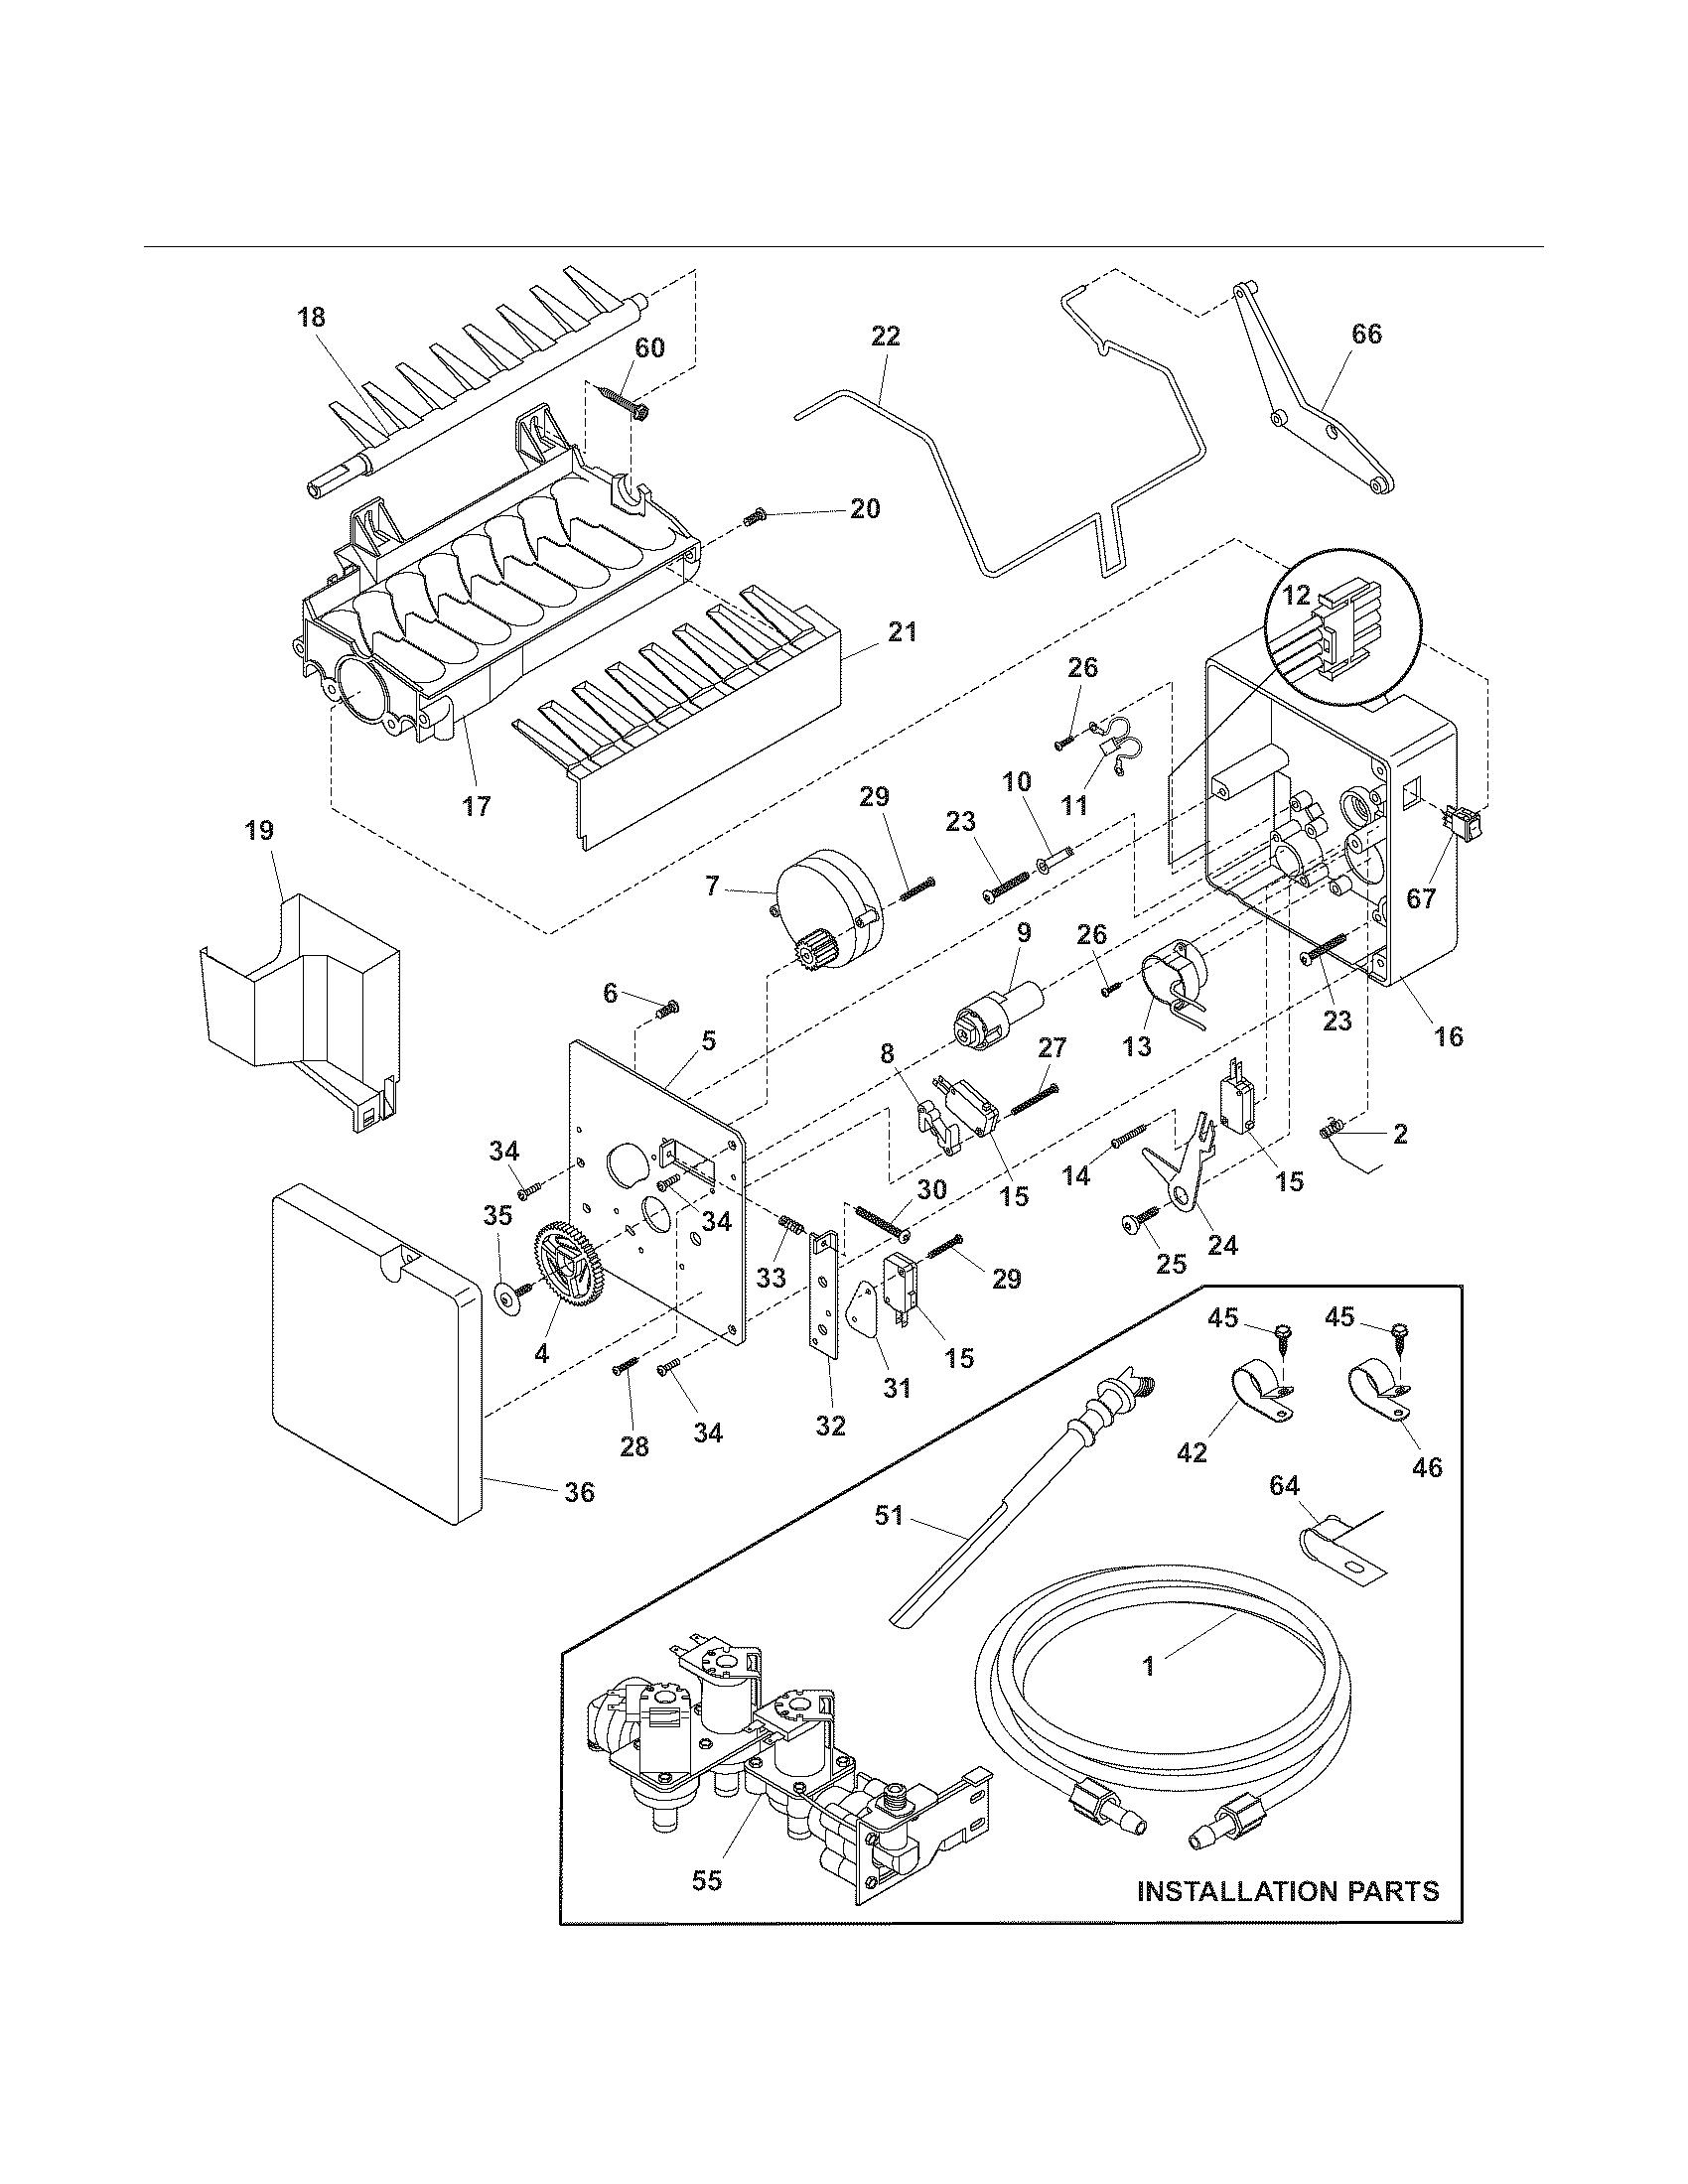 ICE MAKER Diagram & Parts List for Model 25354663405